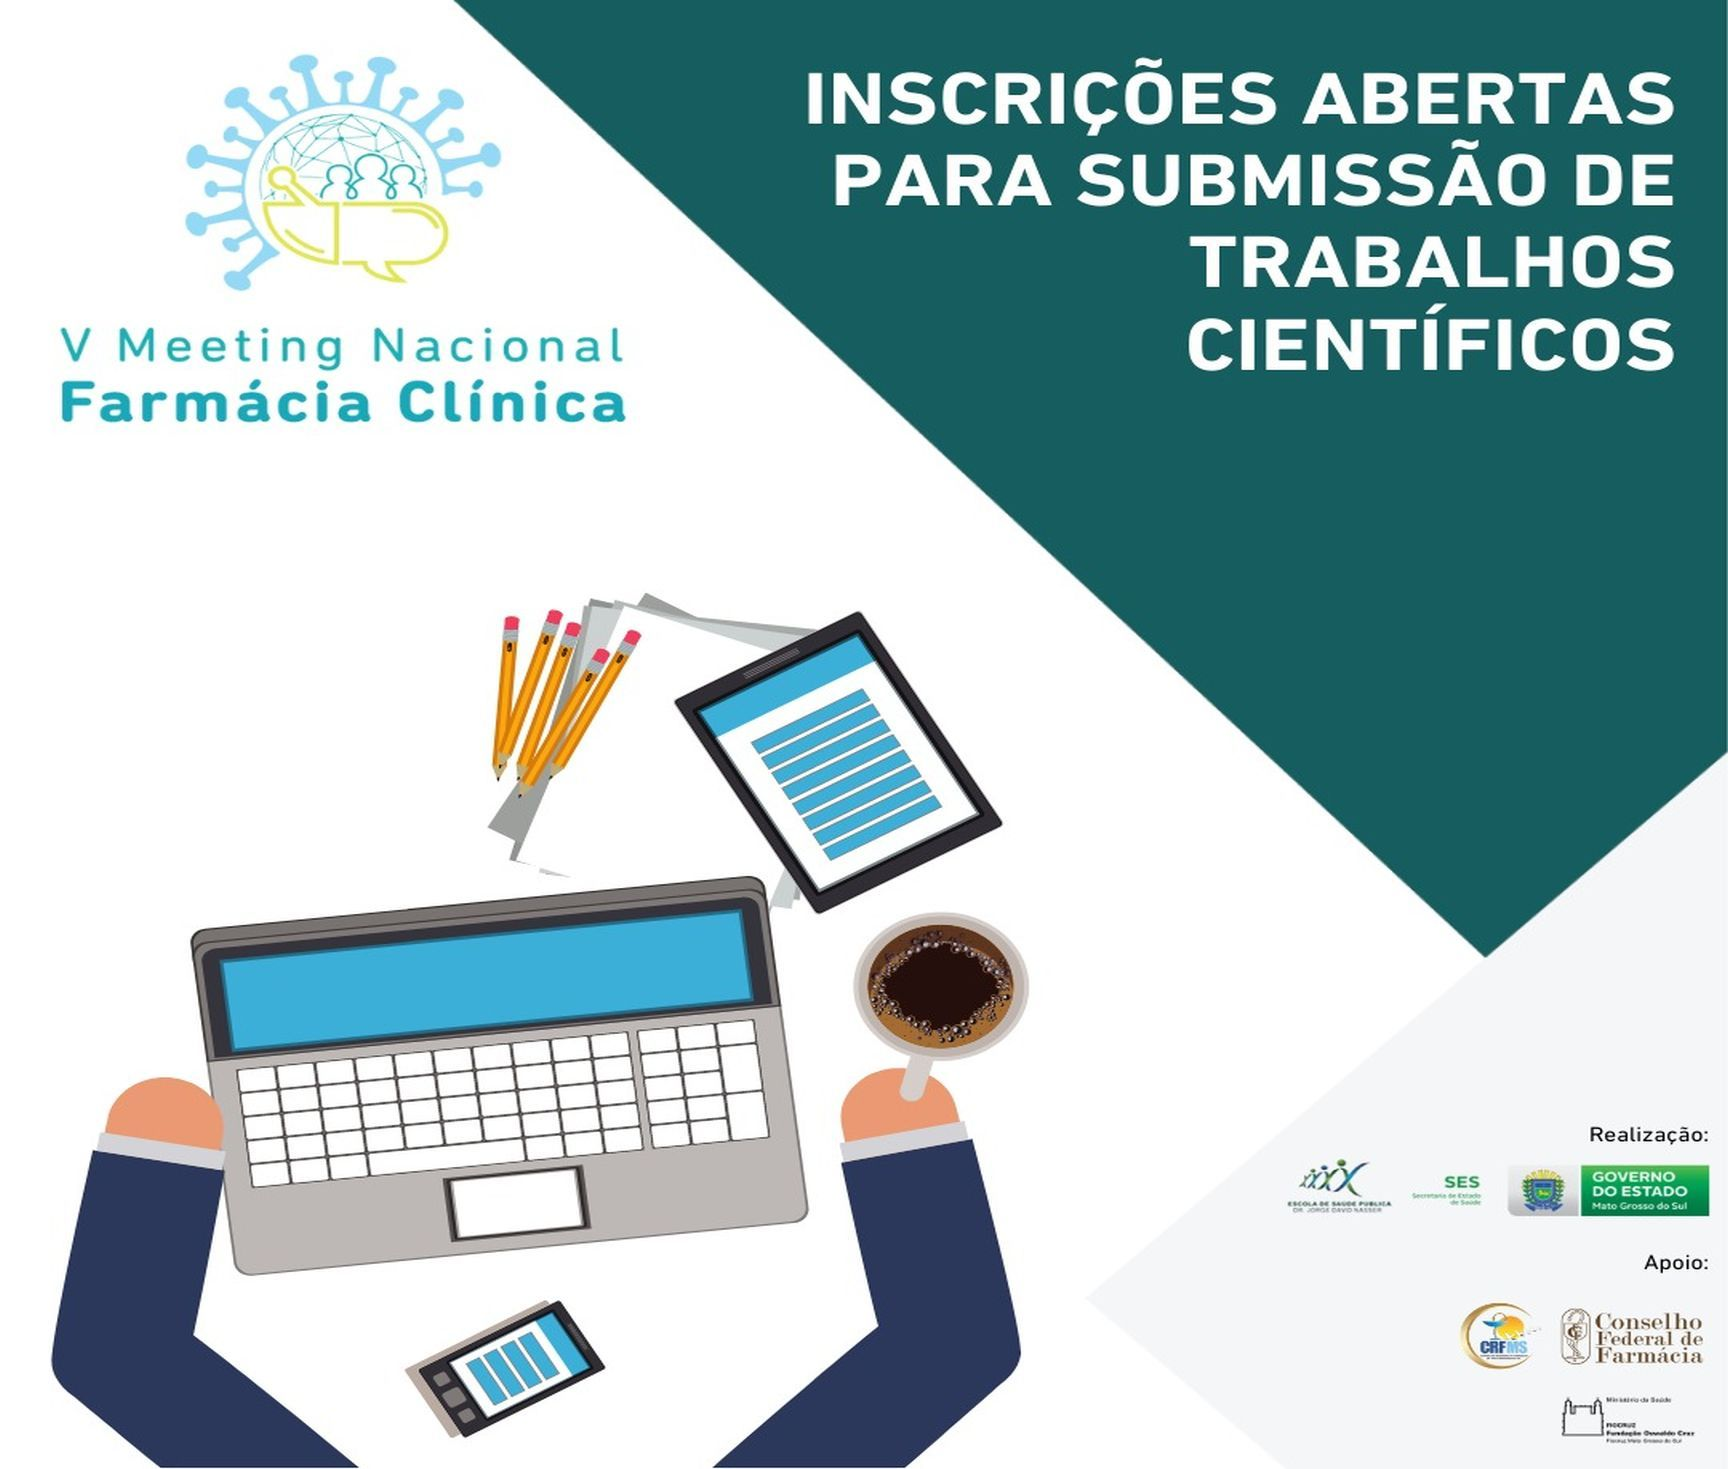 5º Meeting Nacional de Farmácia Clínica